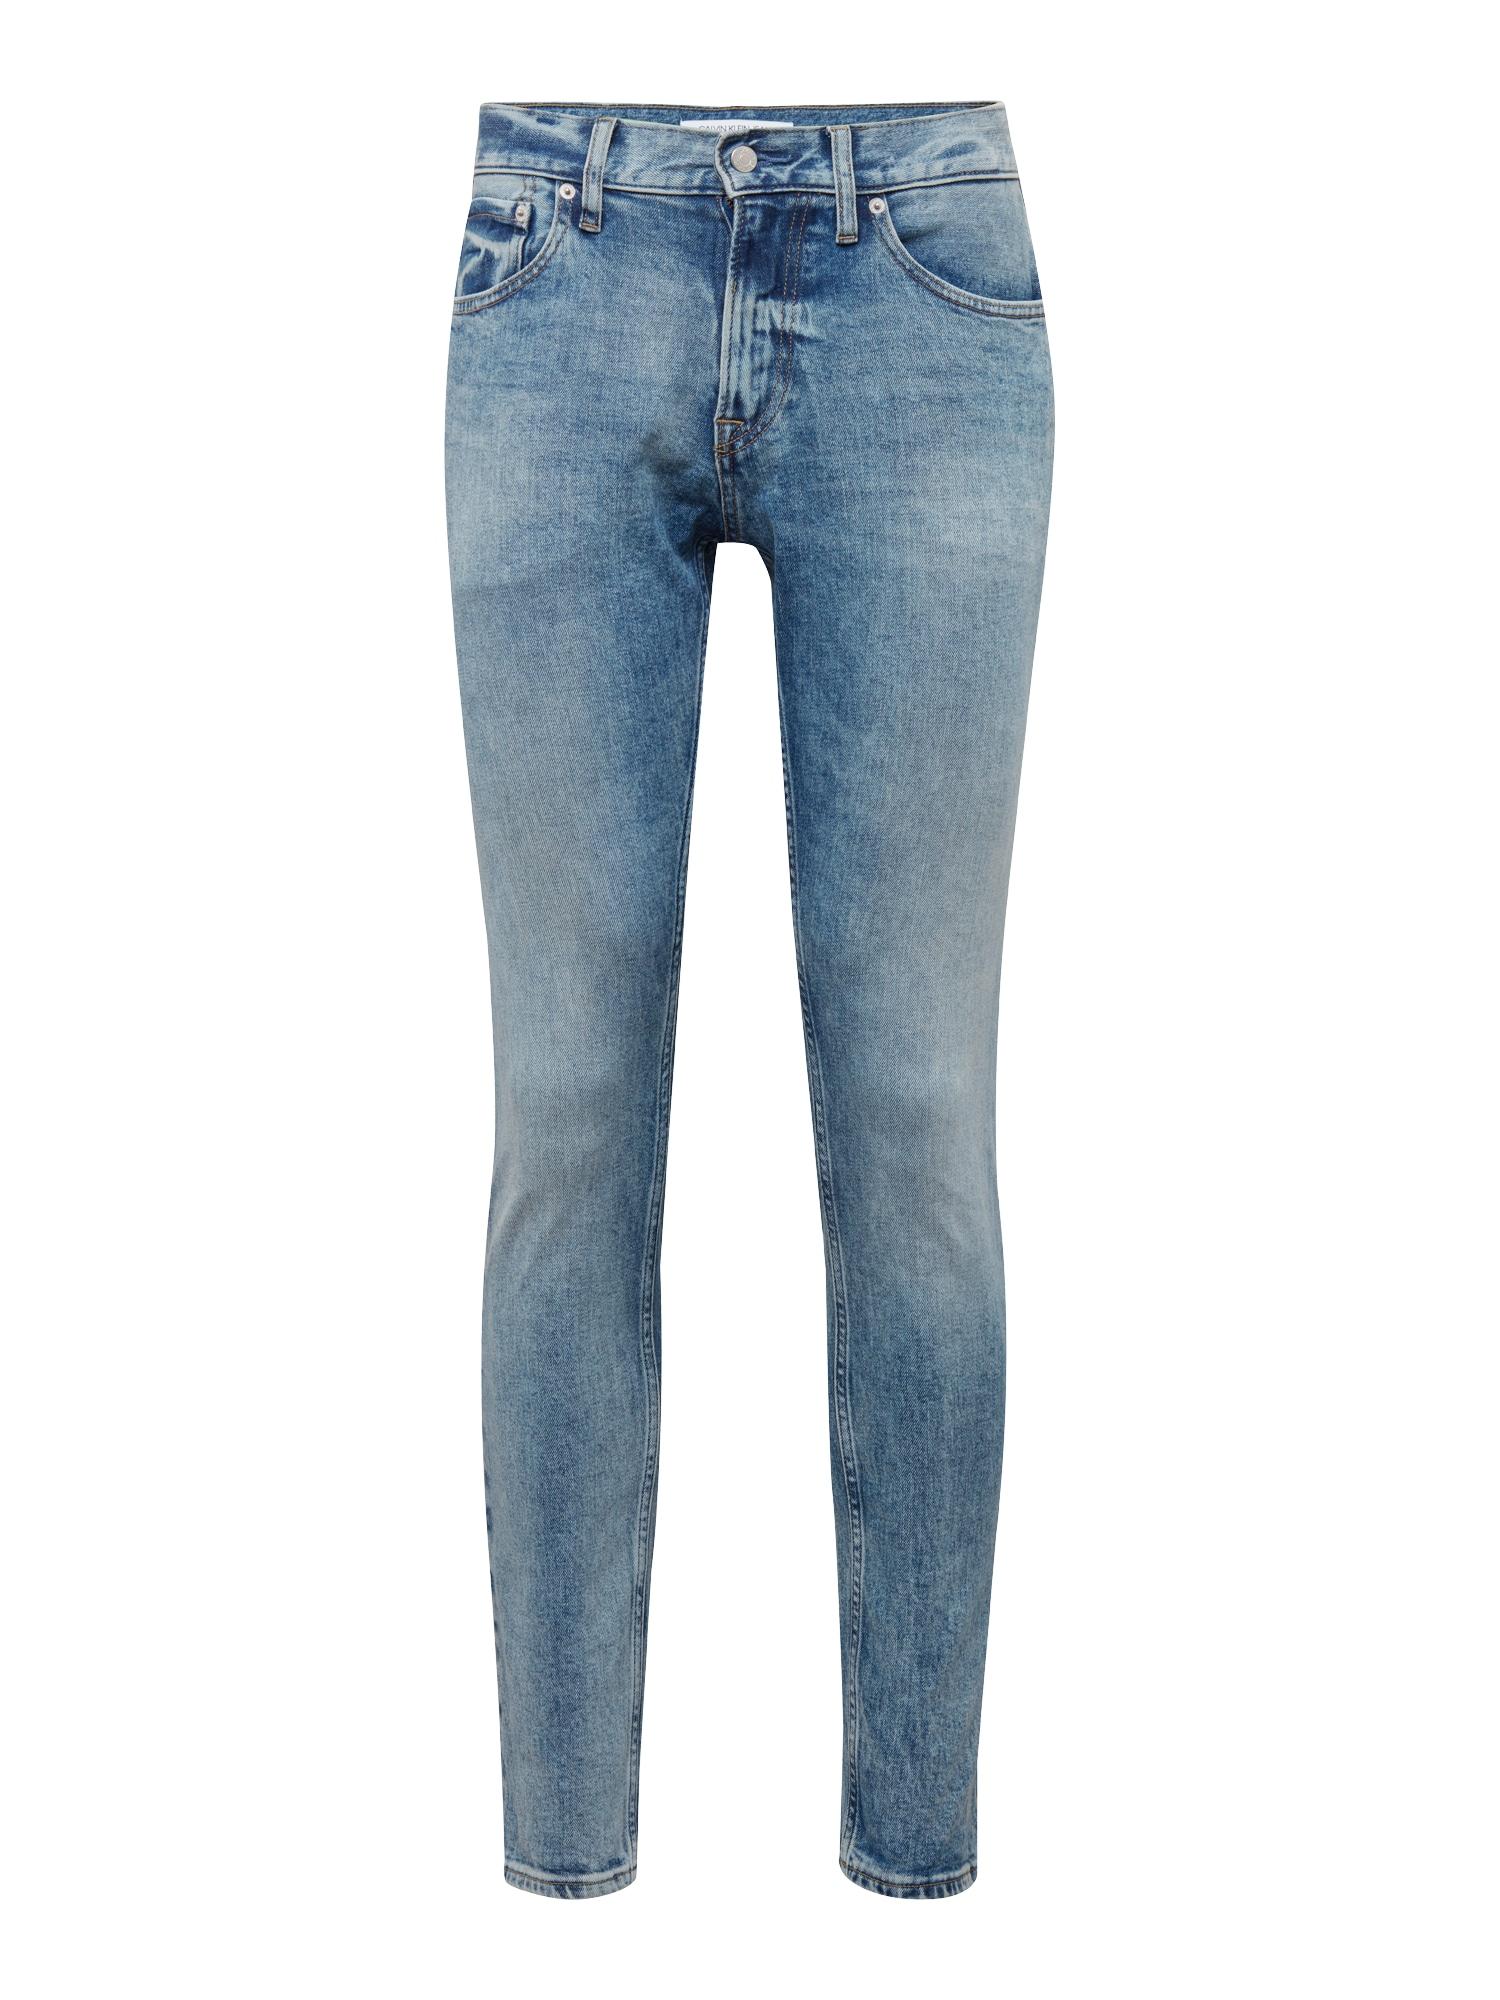 Džíny CKJ 056 ATHLETIC TAPER modrá džínovina Calvin Klein Jeans